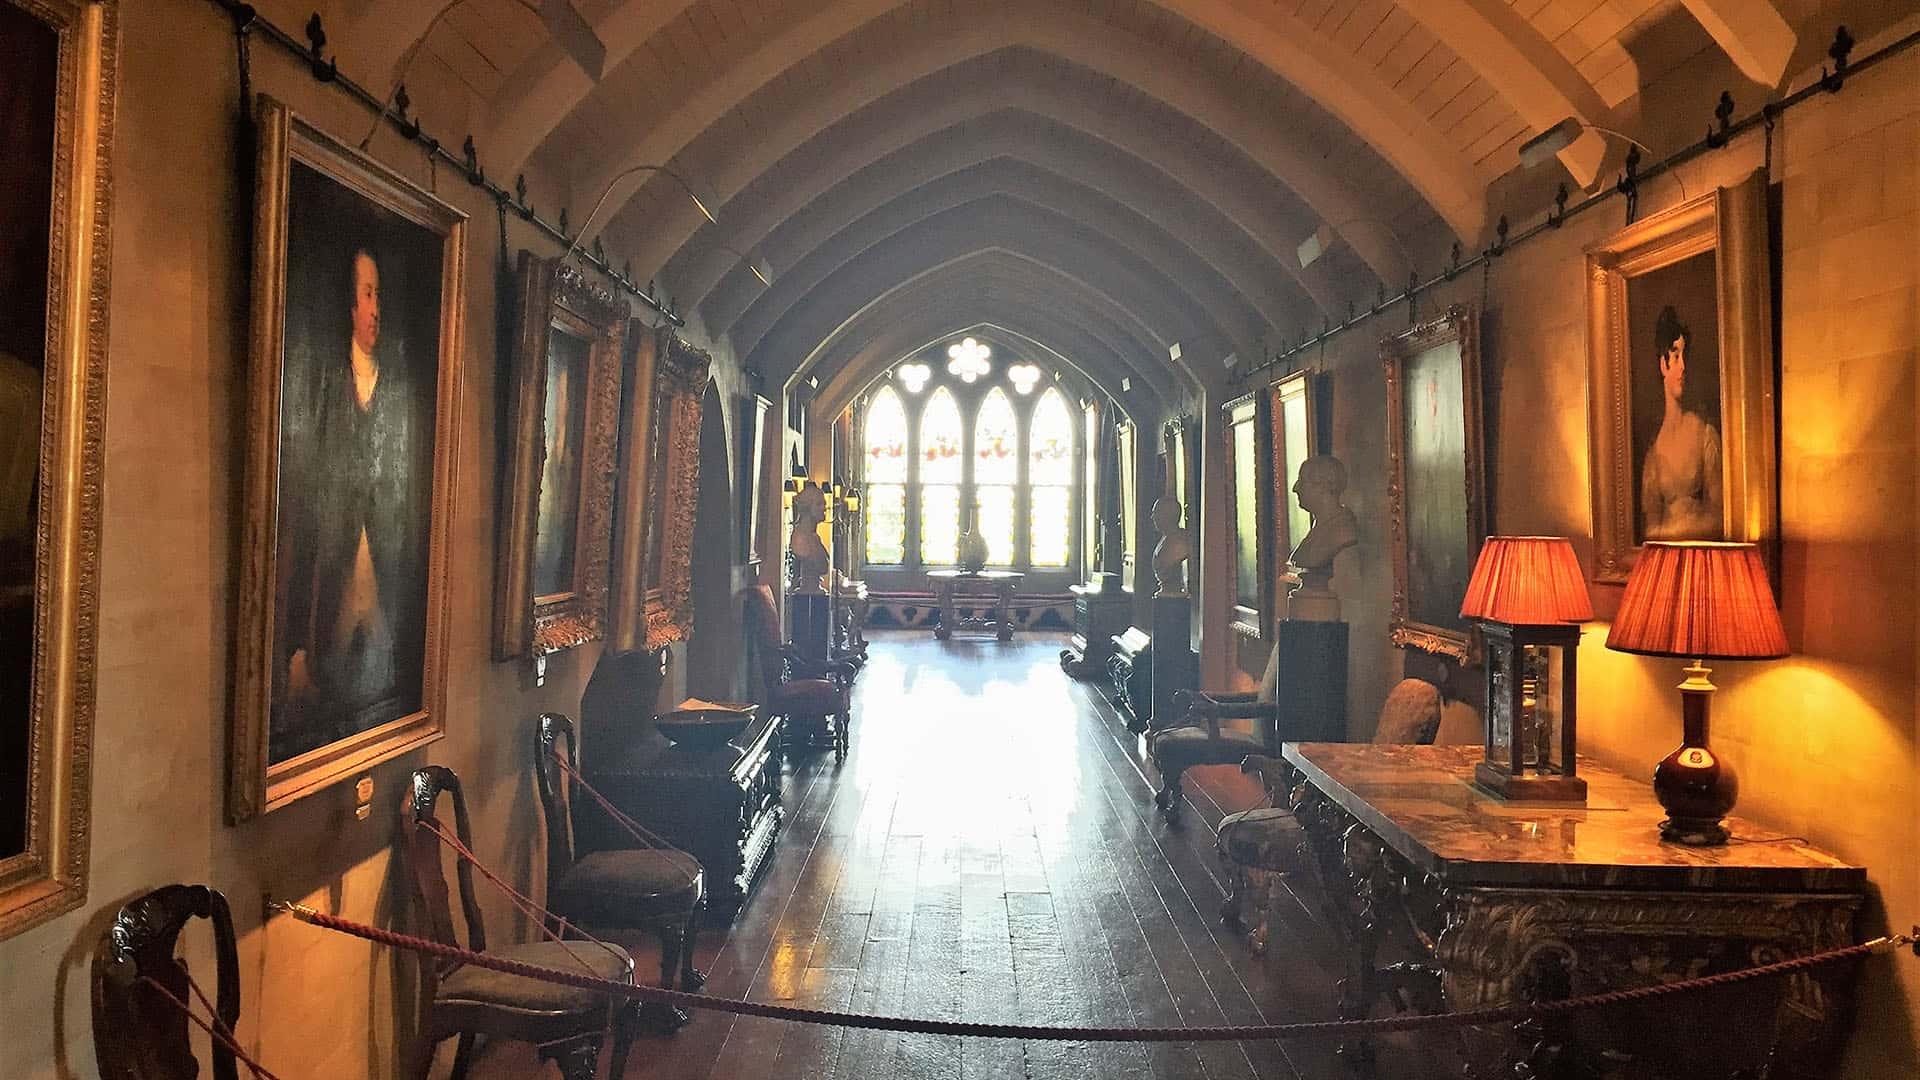 Arundel Castle corridor lined with artworks